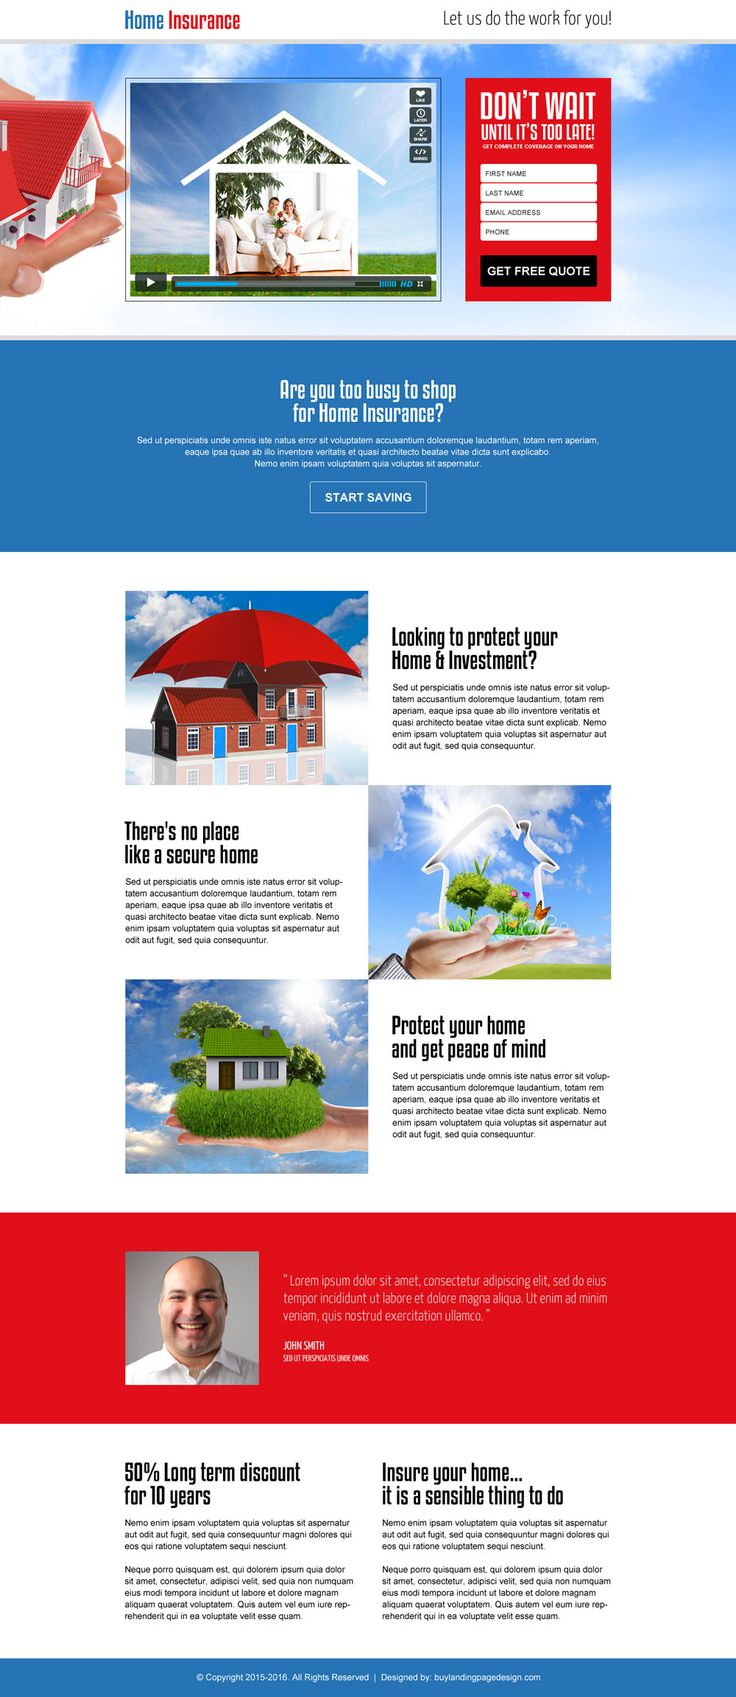 home insurance lead generating video landing page https://www.buylandingpagedesign.com/buy/home-insurance-lead-generating-video-landing-page/1547